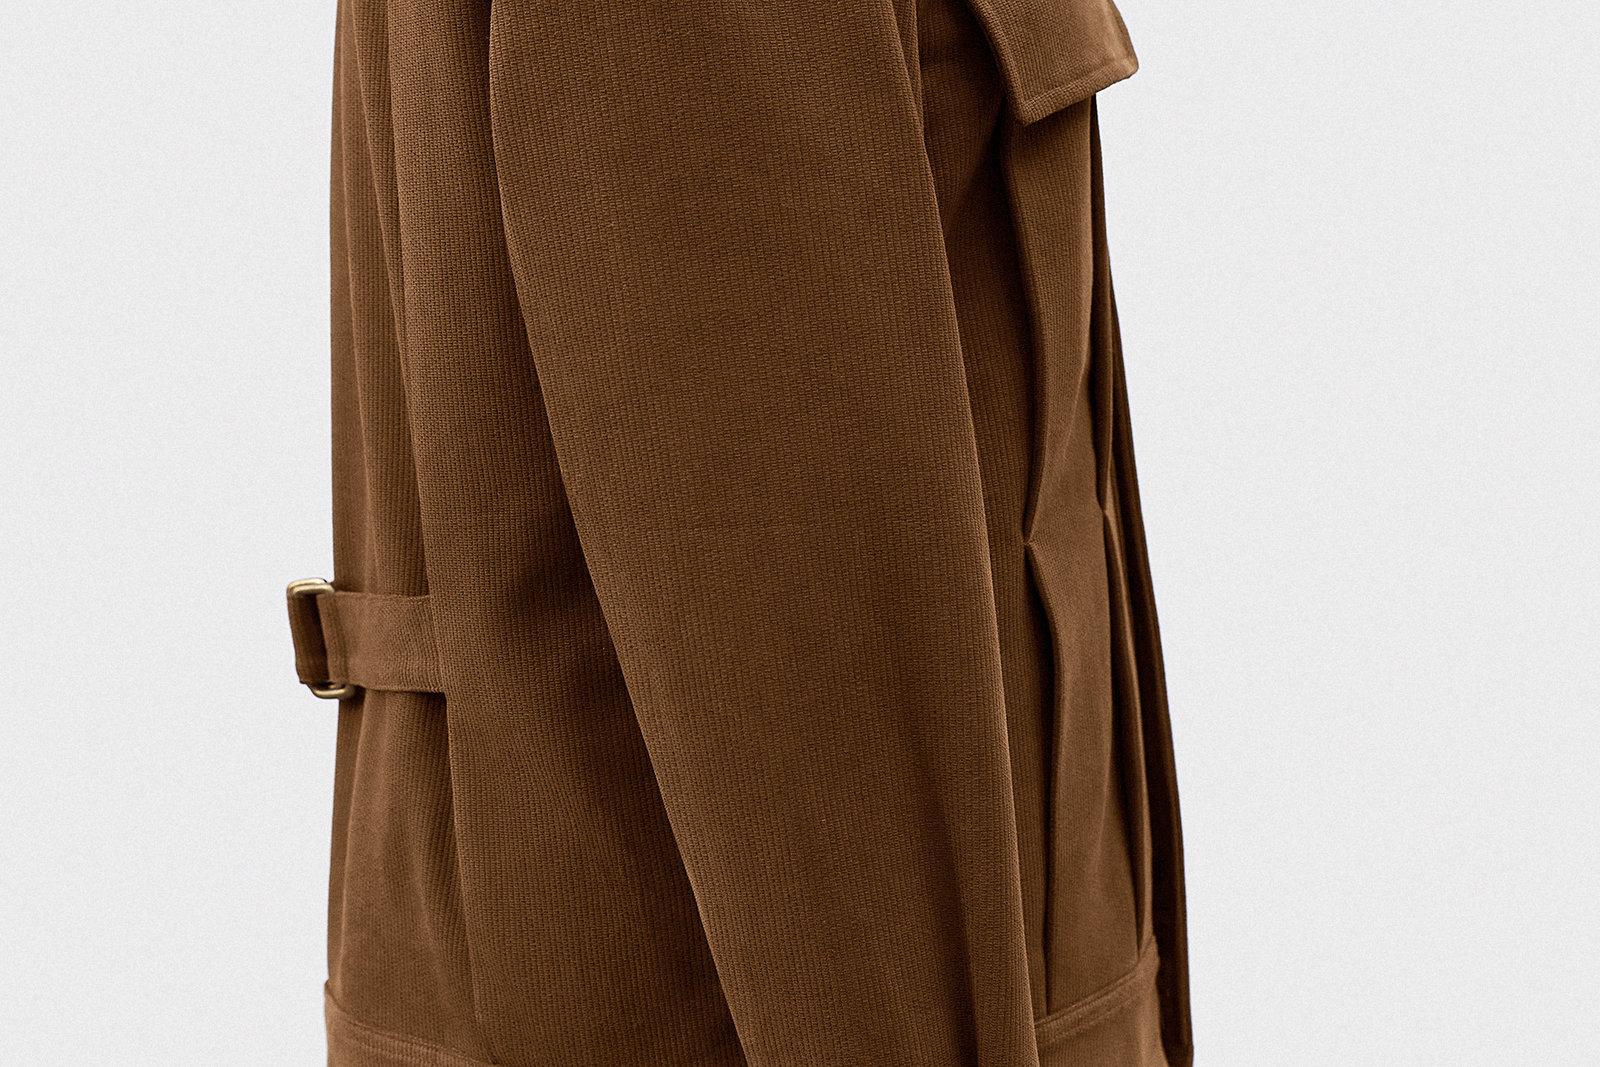 trucker-jacket-bedford-cord-rust-10@2x.jpg